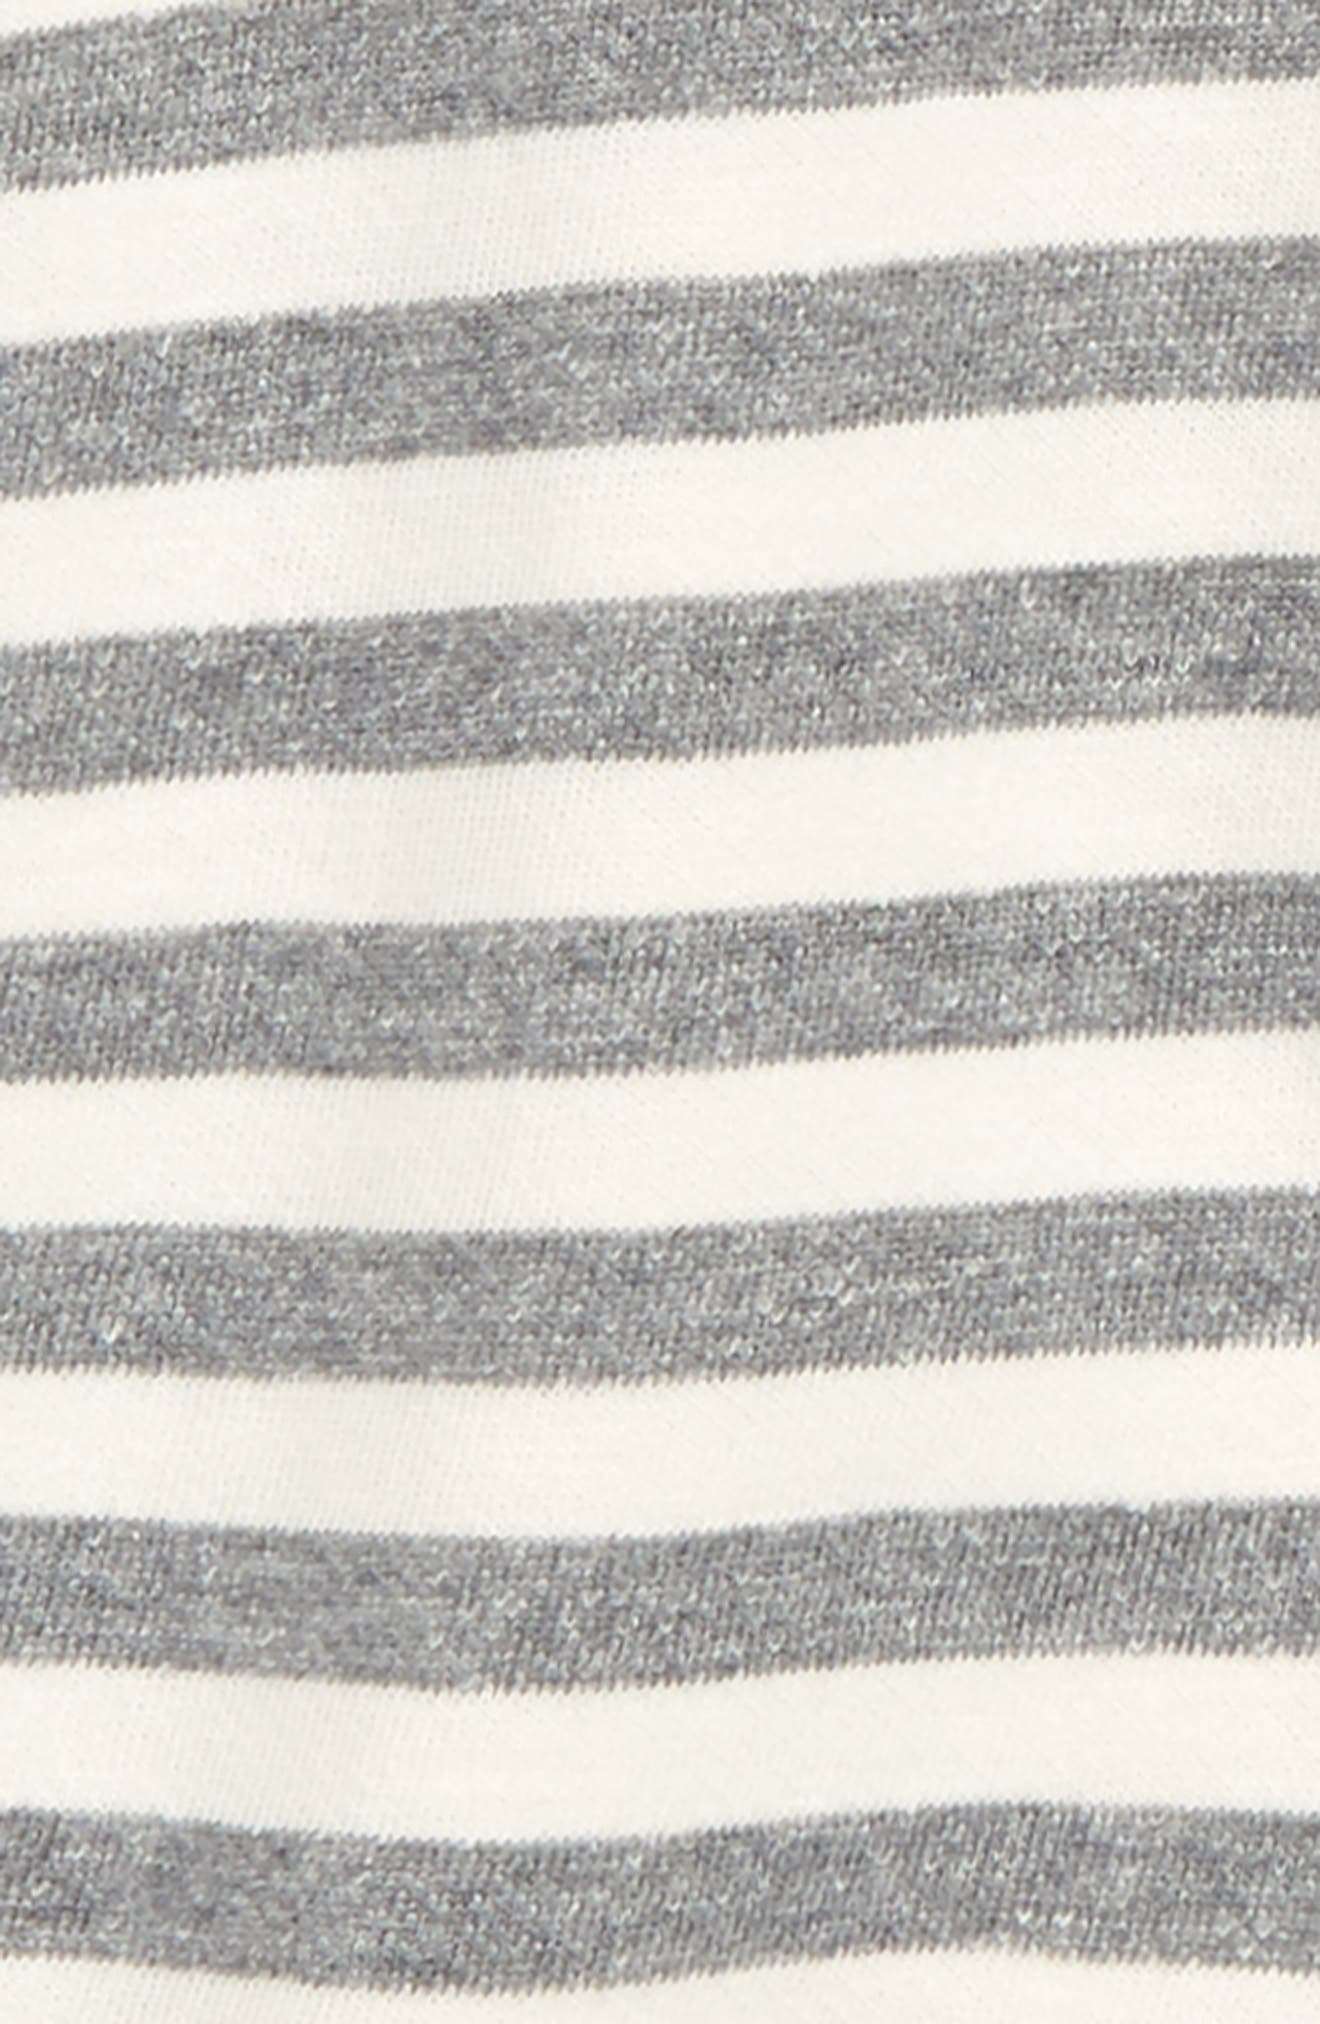 NORDSTROM BABY, Stripe Hooded Romper, Alternate thumbnail 2, color, IVORY EGRET- GREY STRIPE